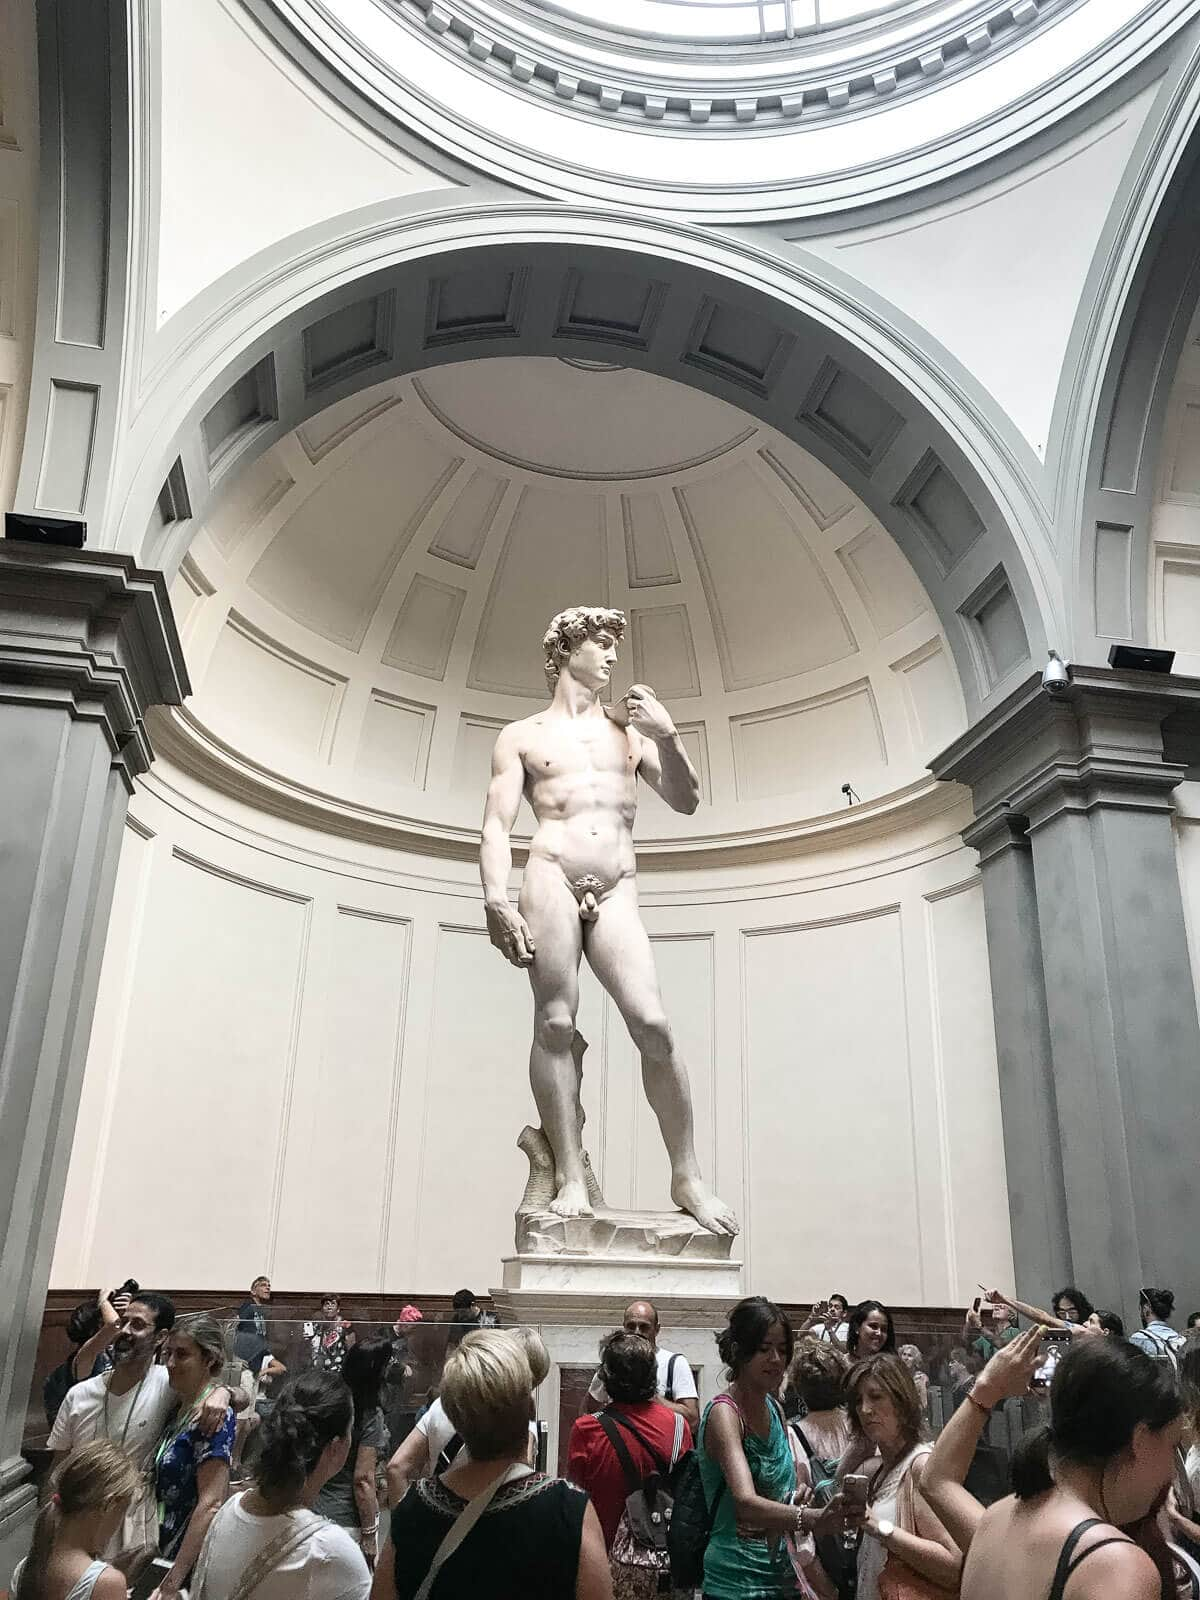 Accademia Museum Michelangelo's David